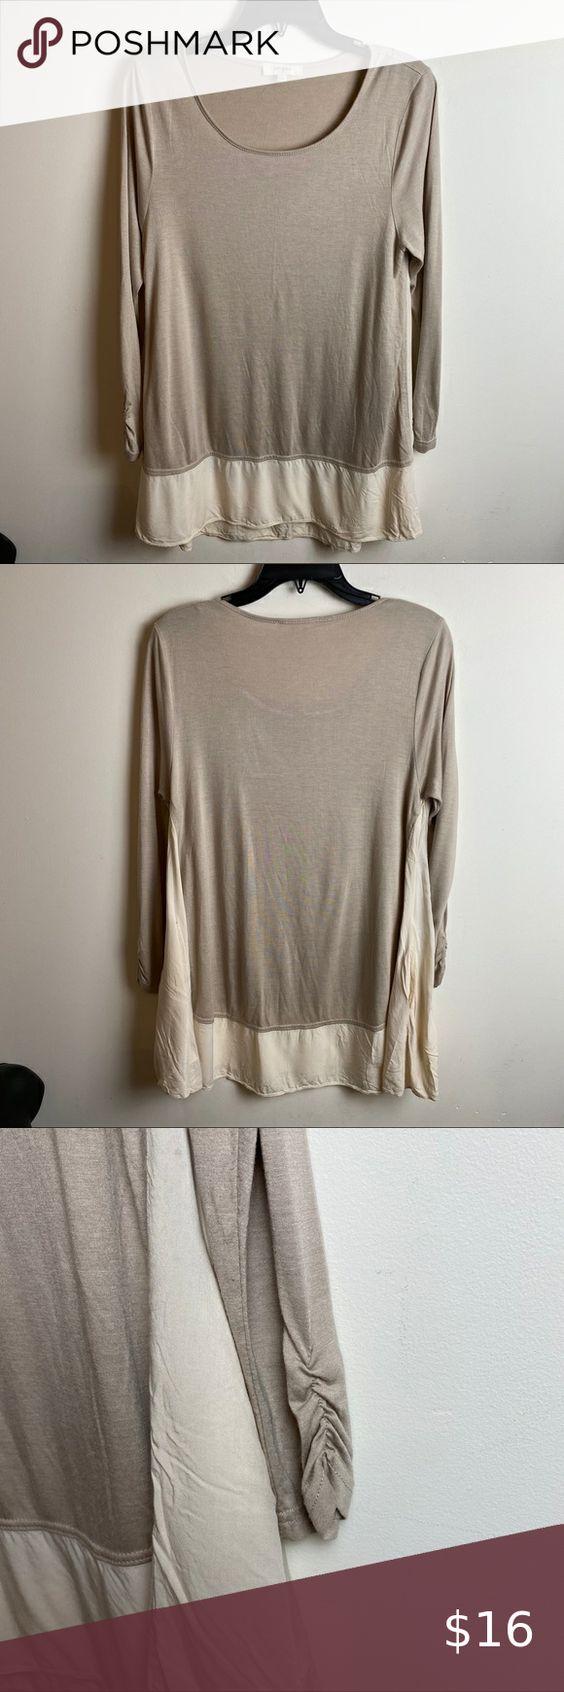 NWT Knox Rose Womens Side Tie Oil Wash French Terry Crewneck Sweatshirt Grey